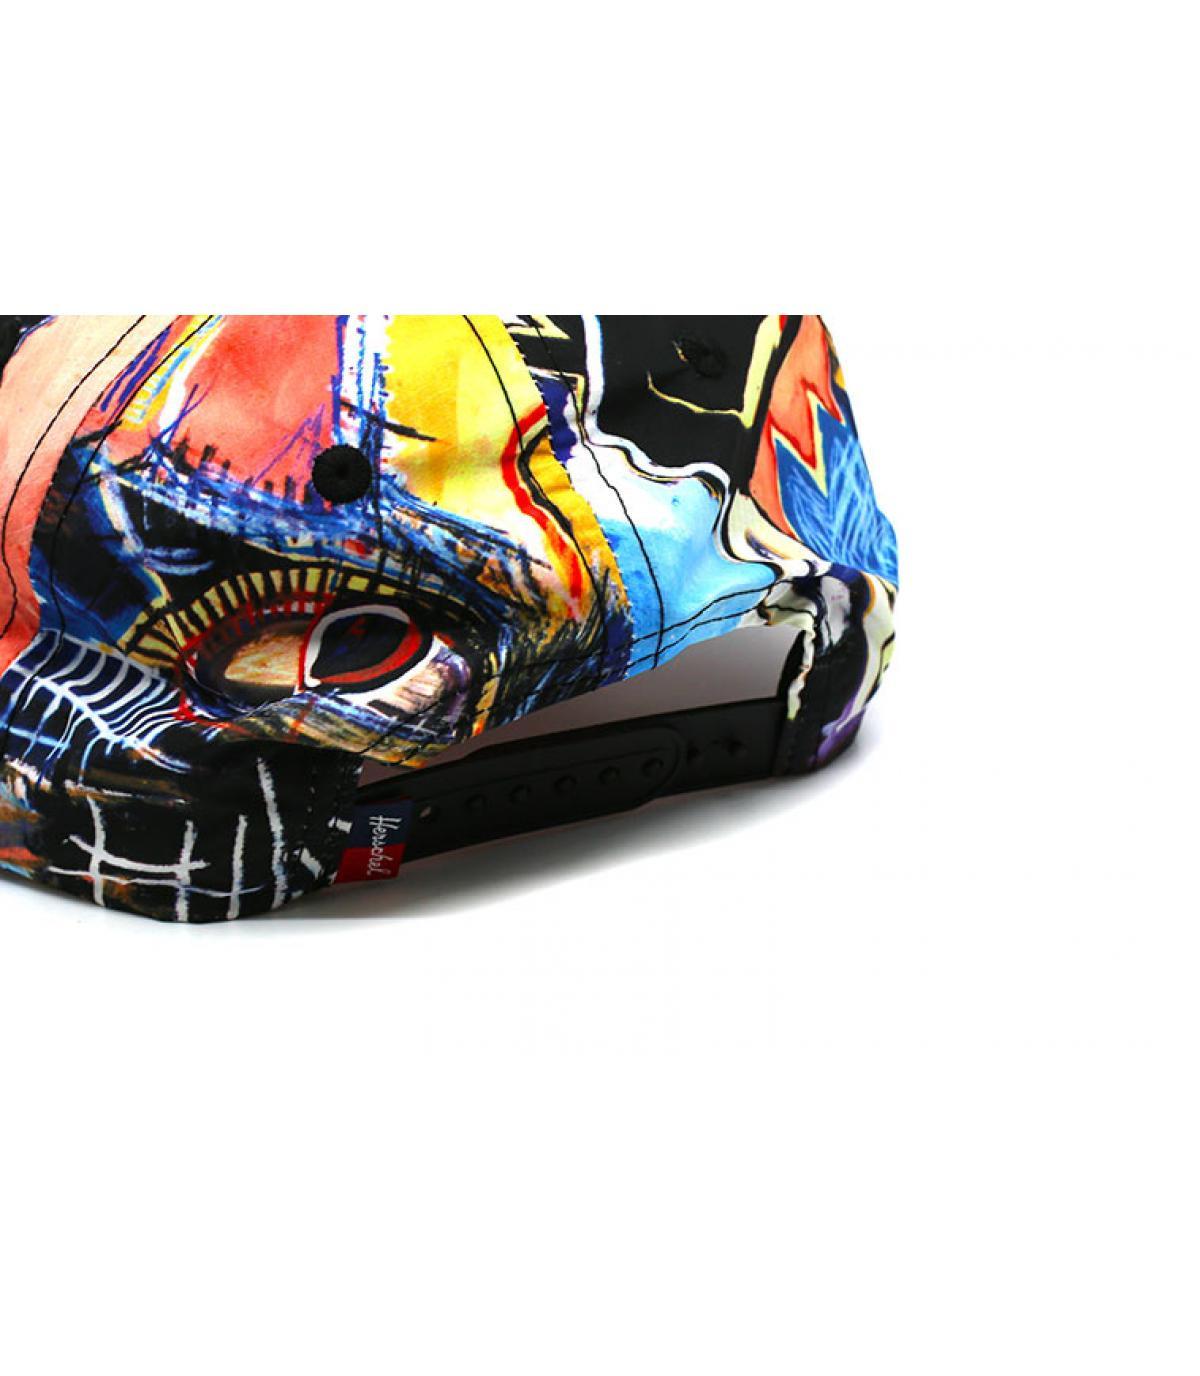 Details Curve Basquiat Mosby Voyage - afbeeling 5